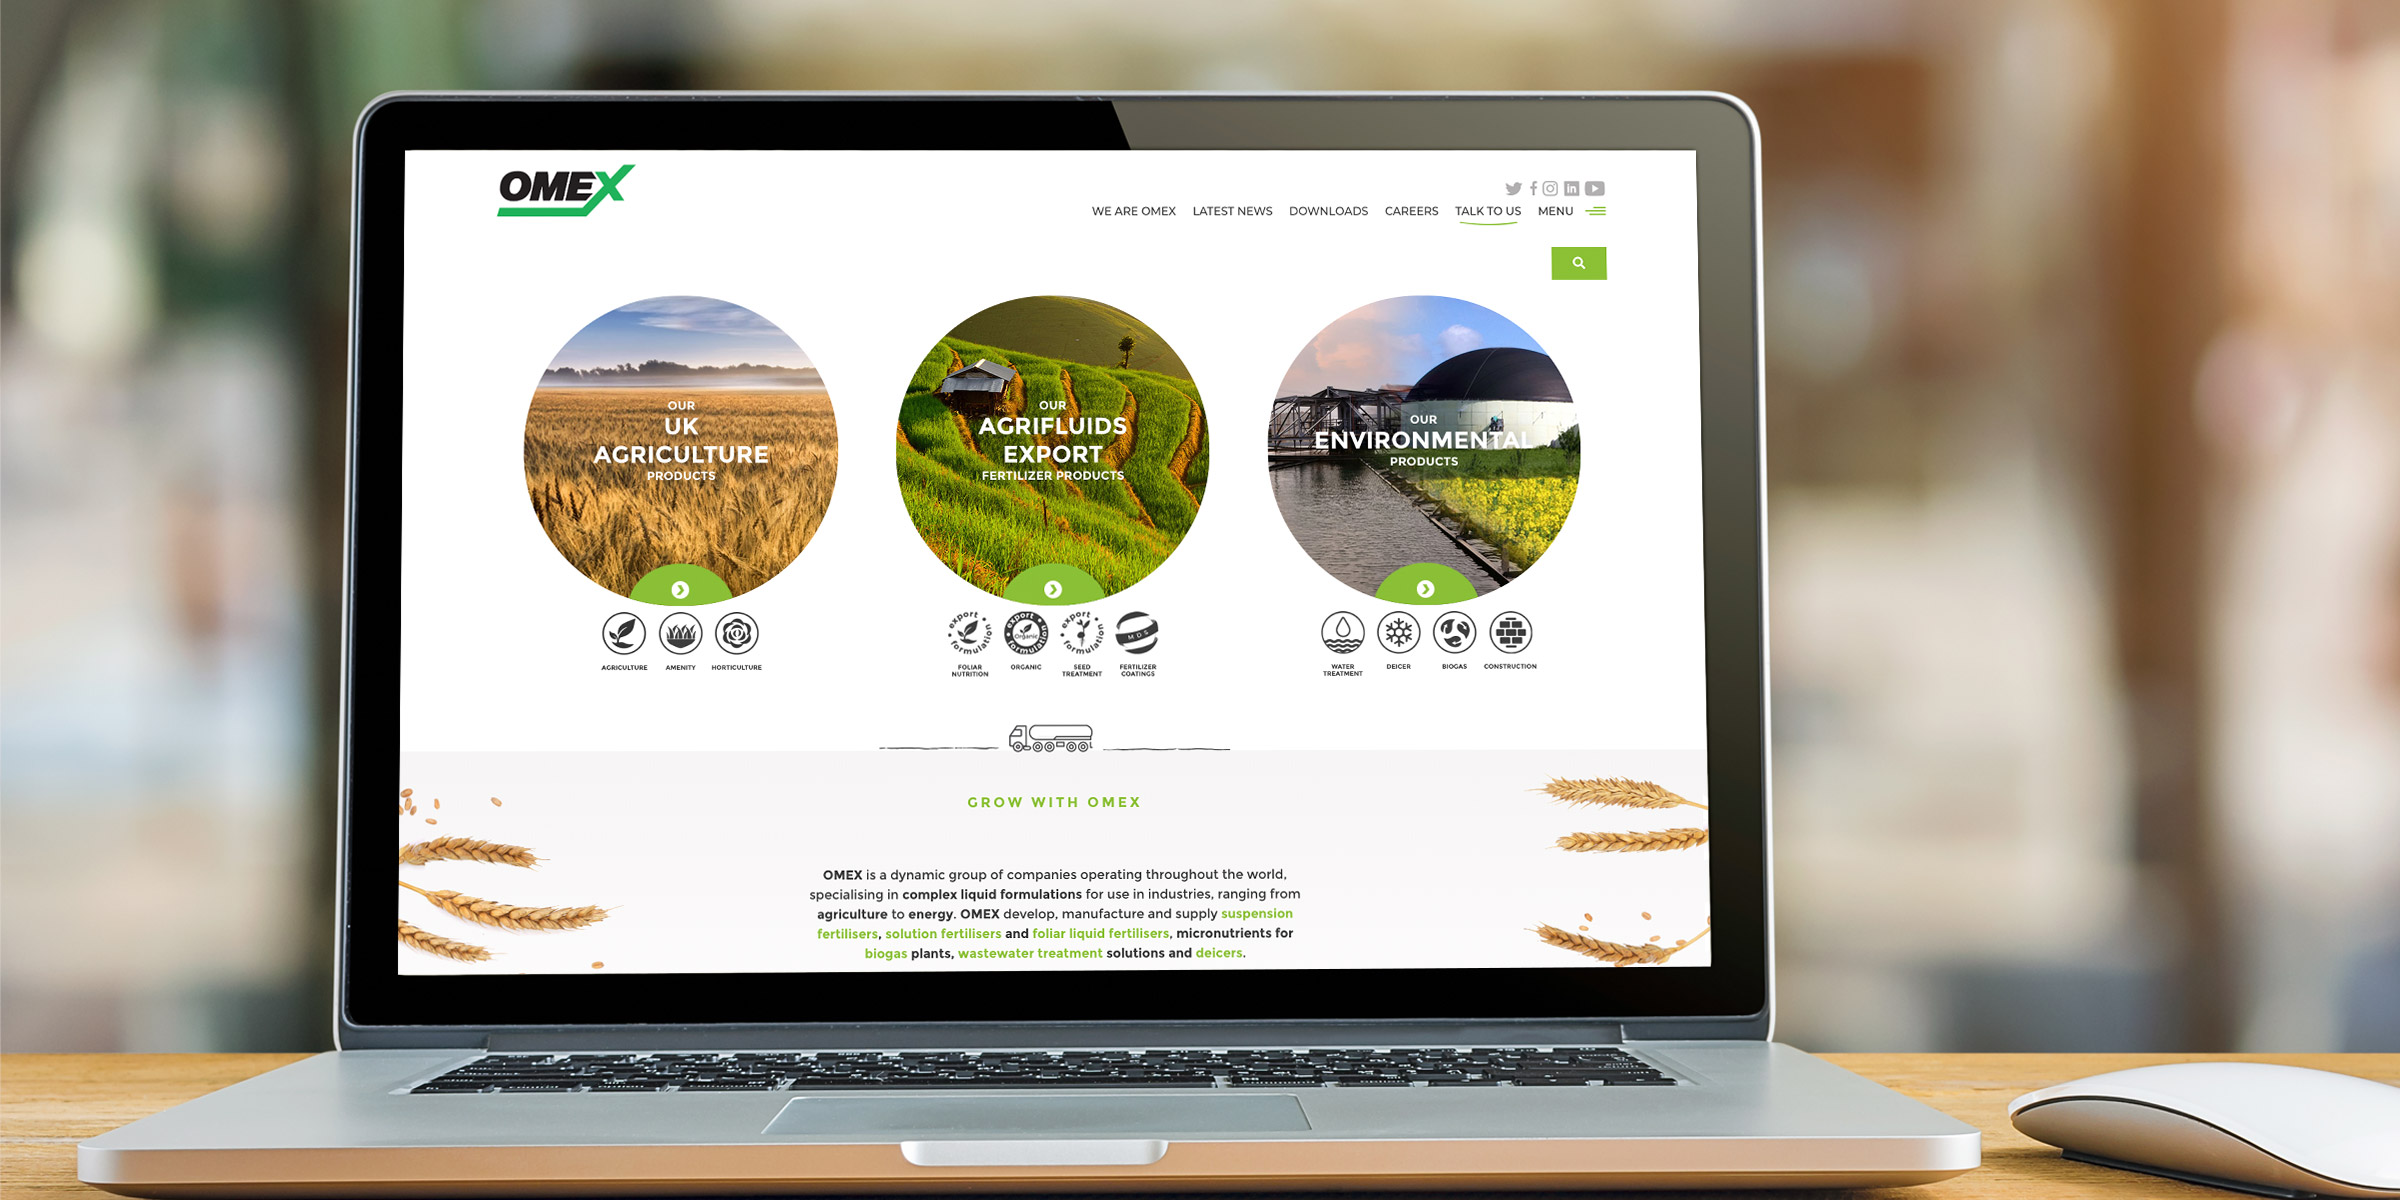 OMEX website design